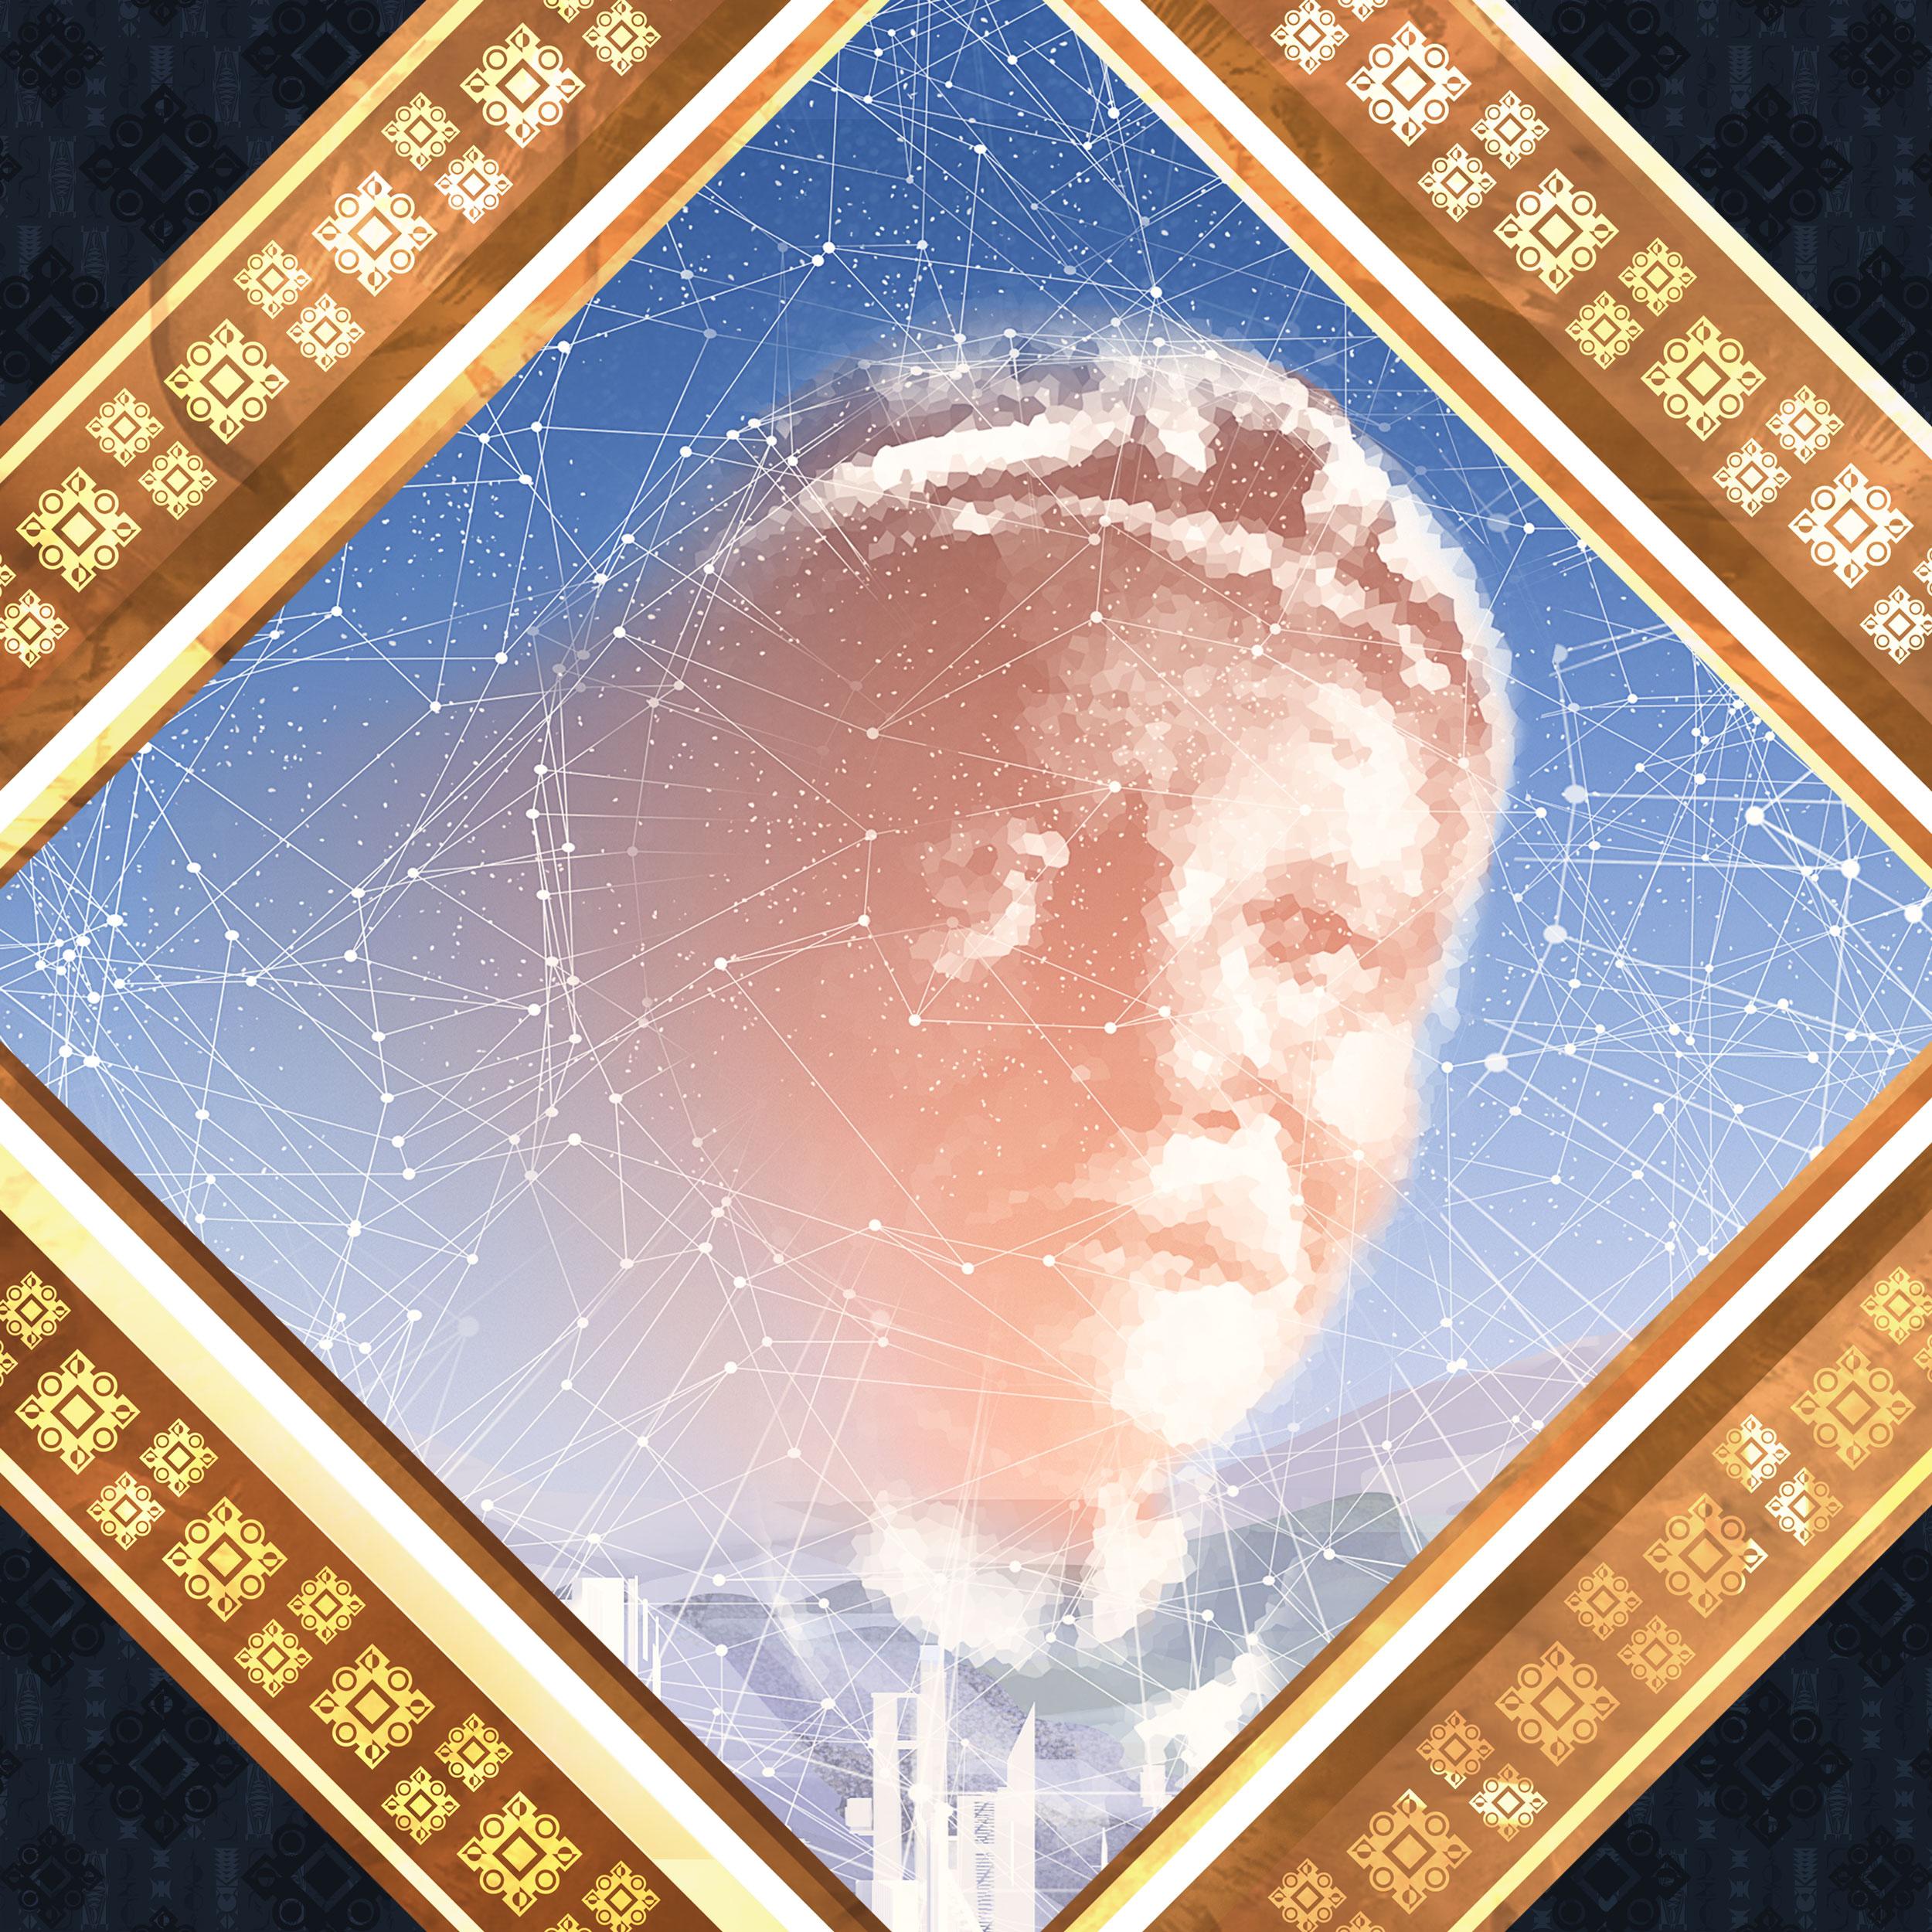 UMURAGE_Fatured_LegacyMaker_Mandela.jpg